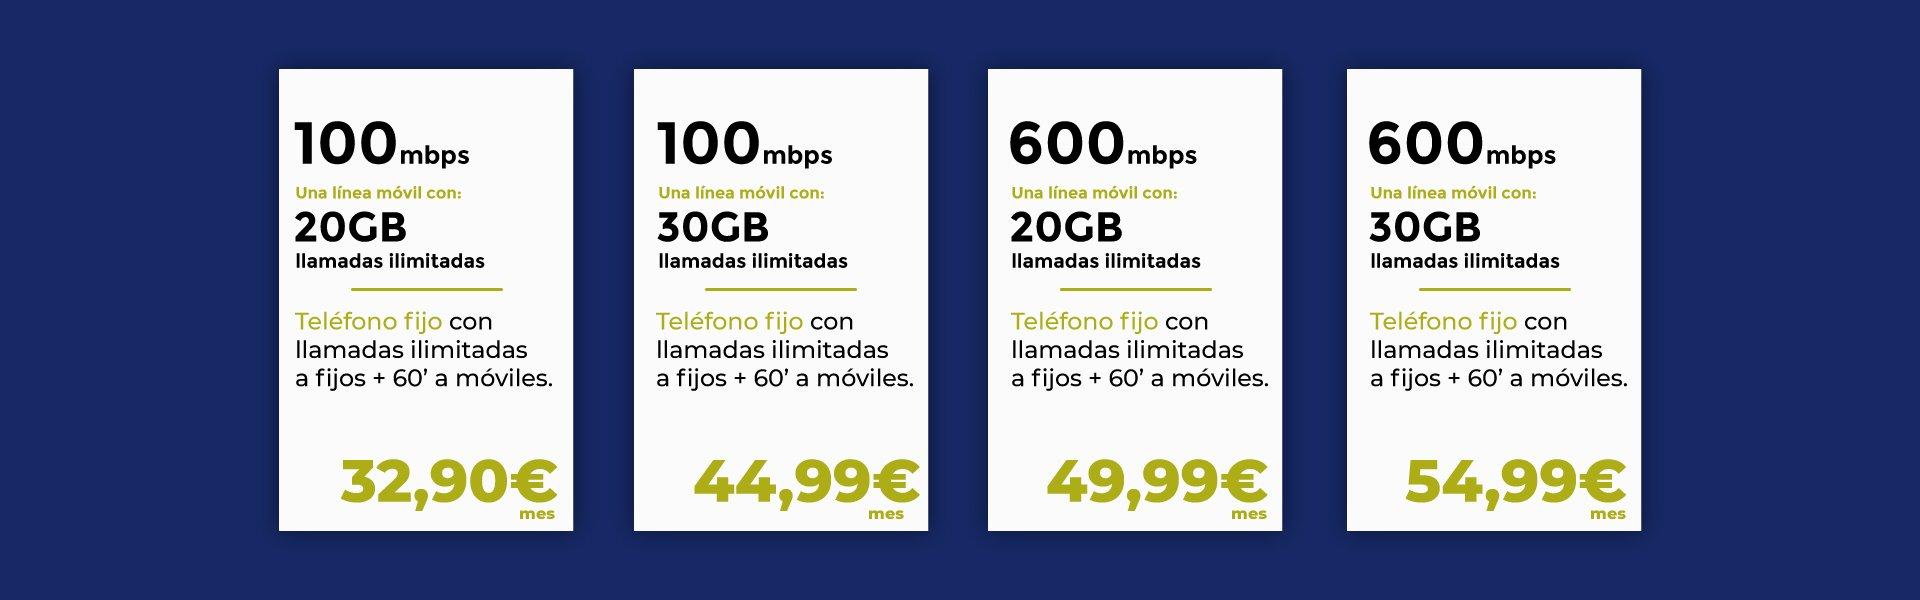 tarifas de fibra y móvil de Mobilfree